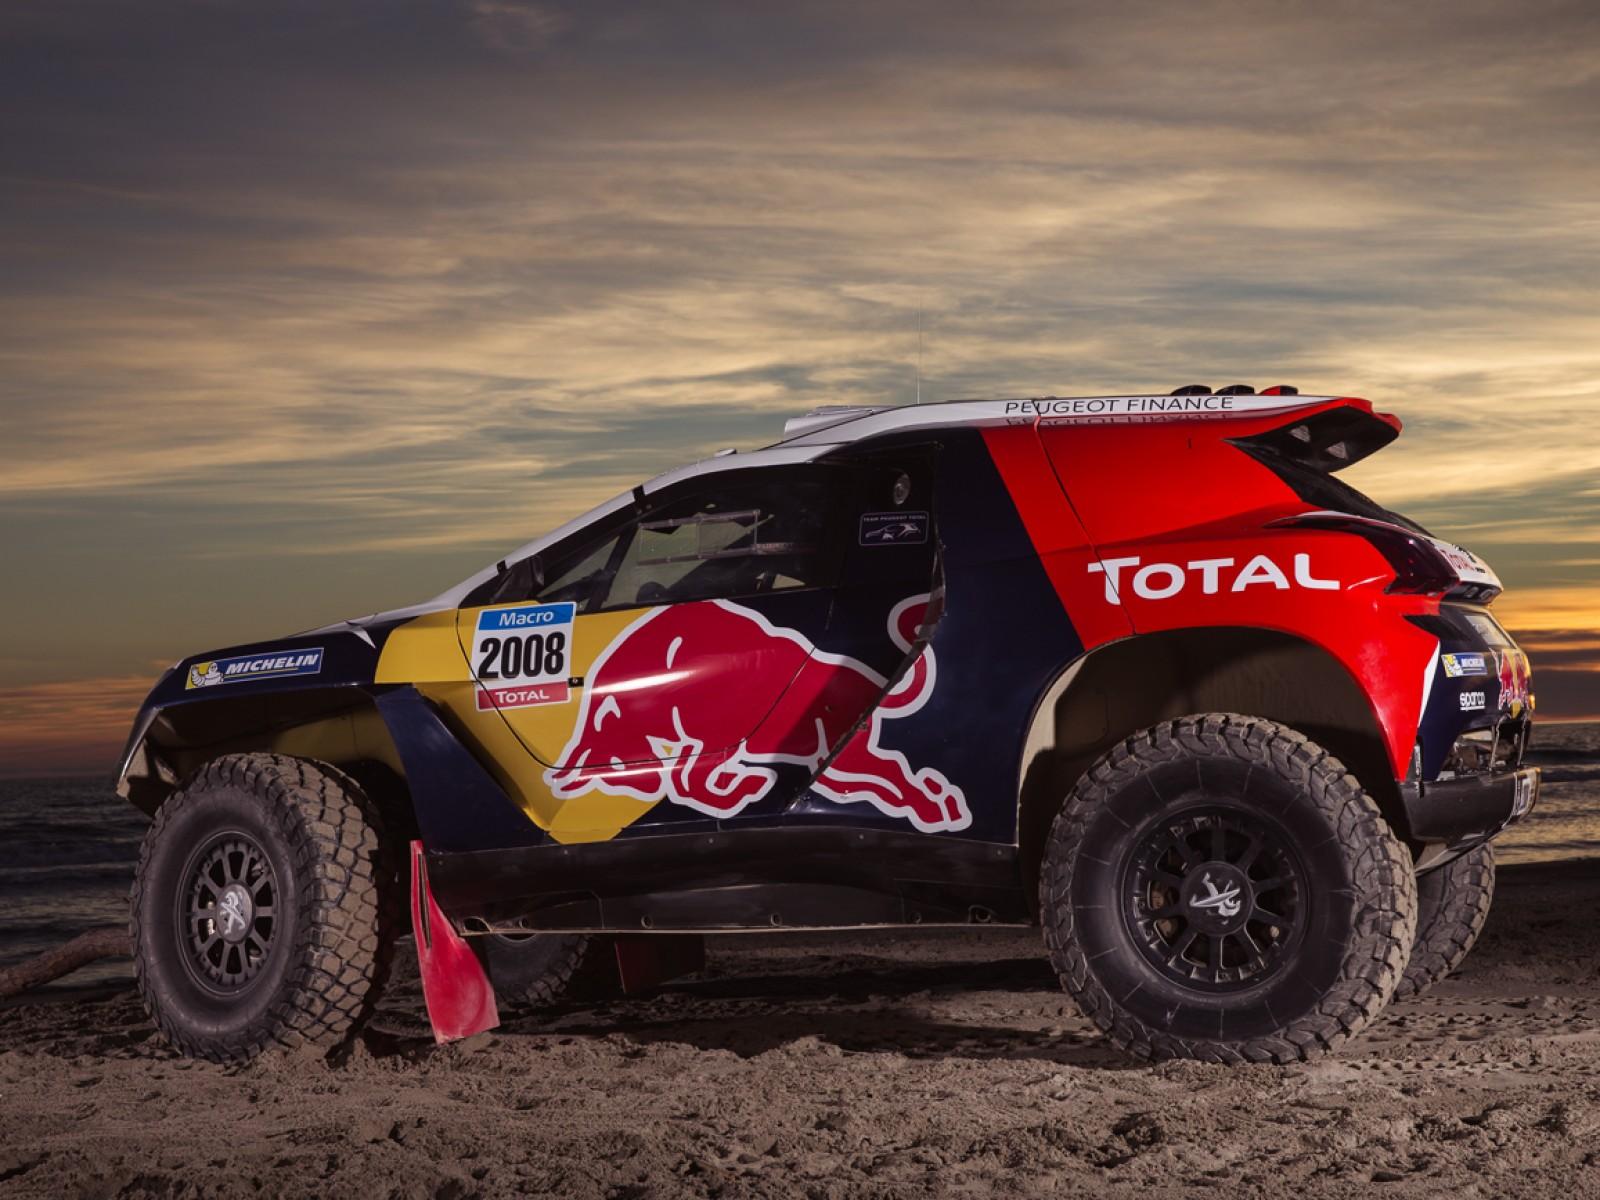 Peugeot prezinta in premiera grafica modelului 2008 pentru Dakar 2015